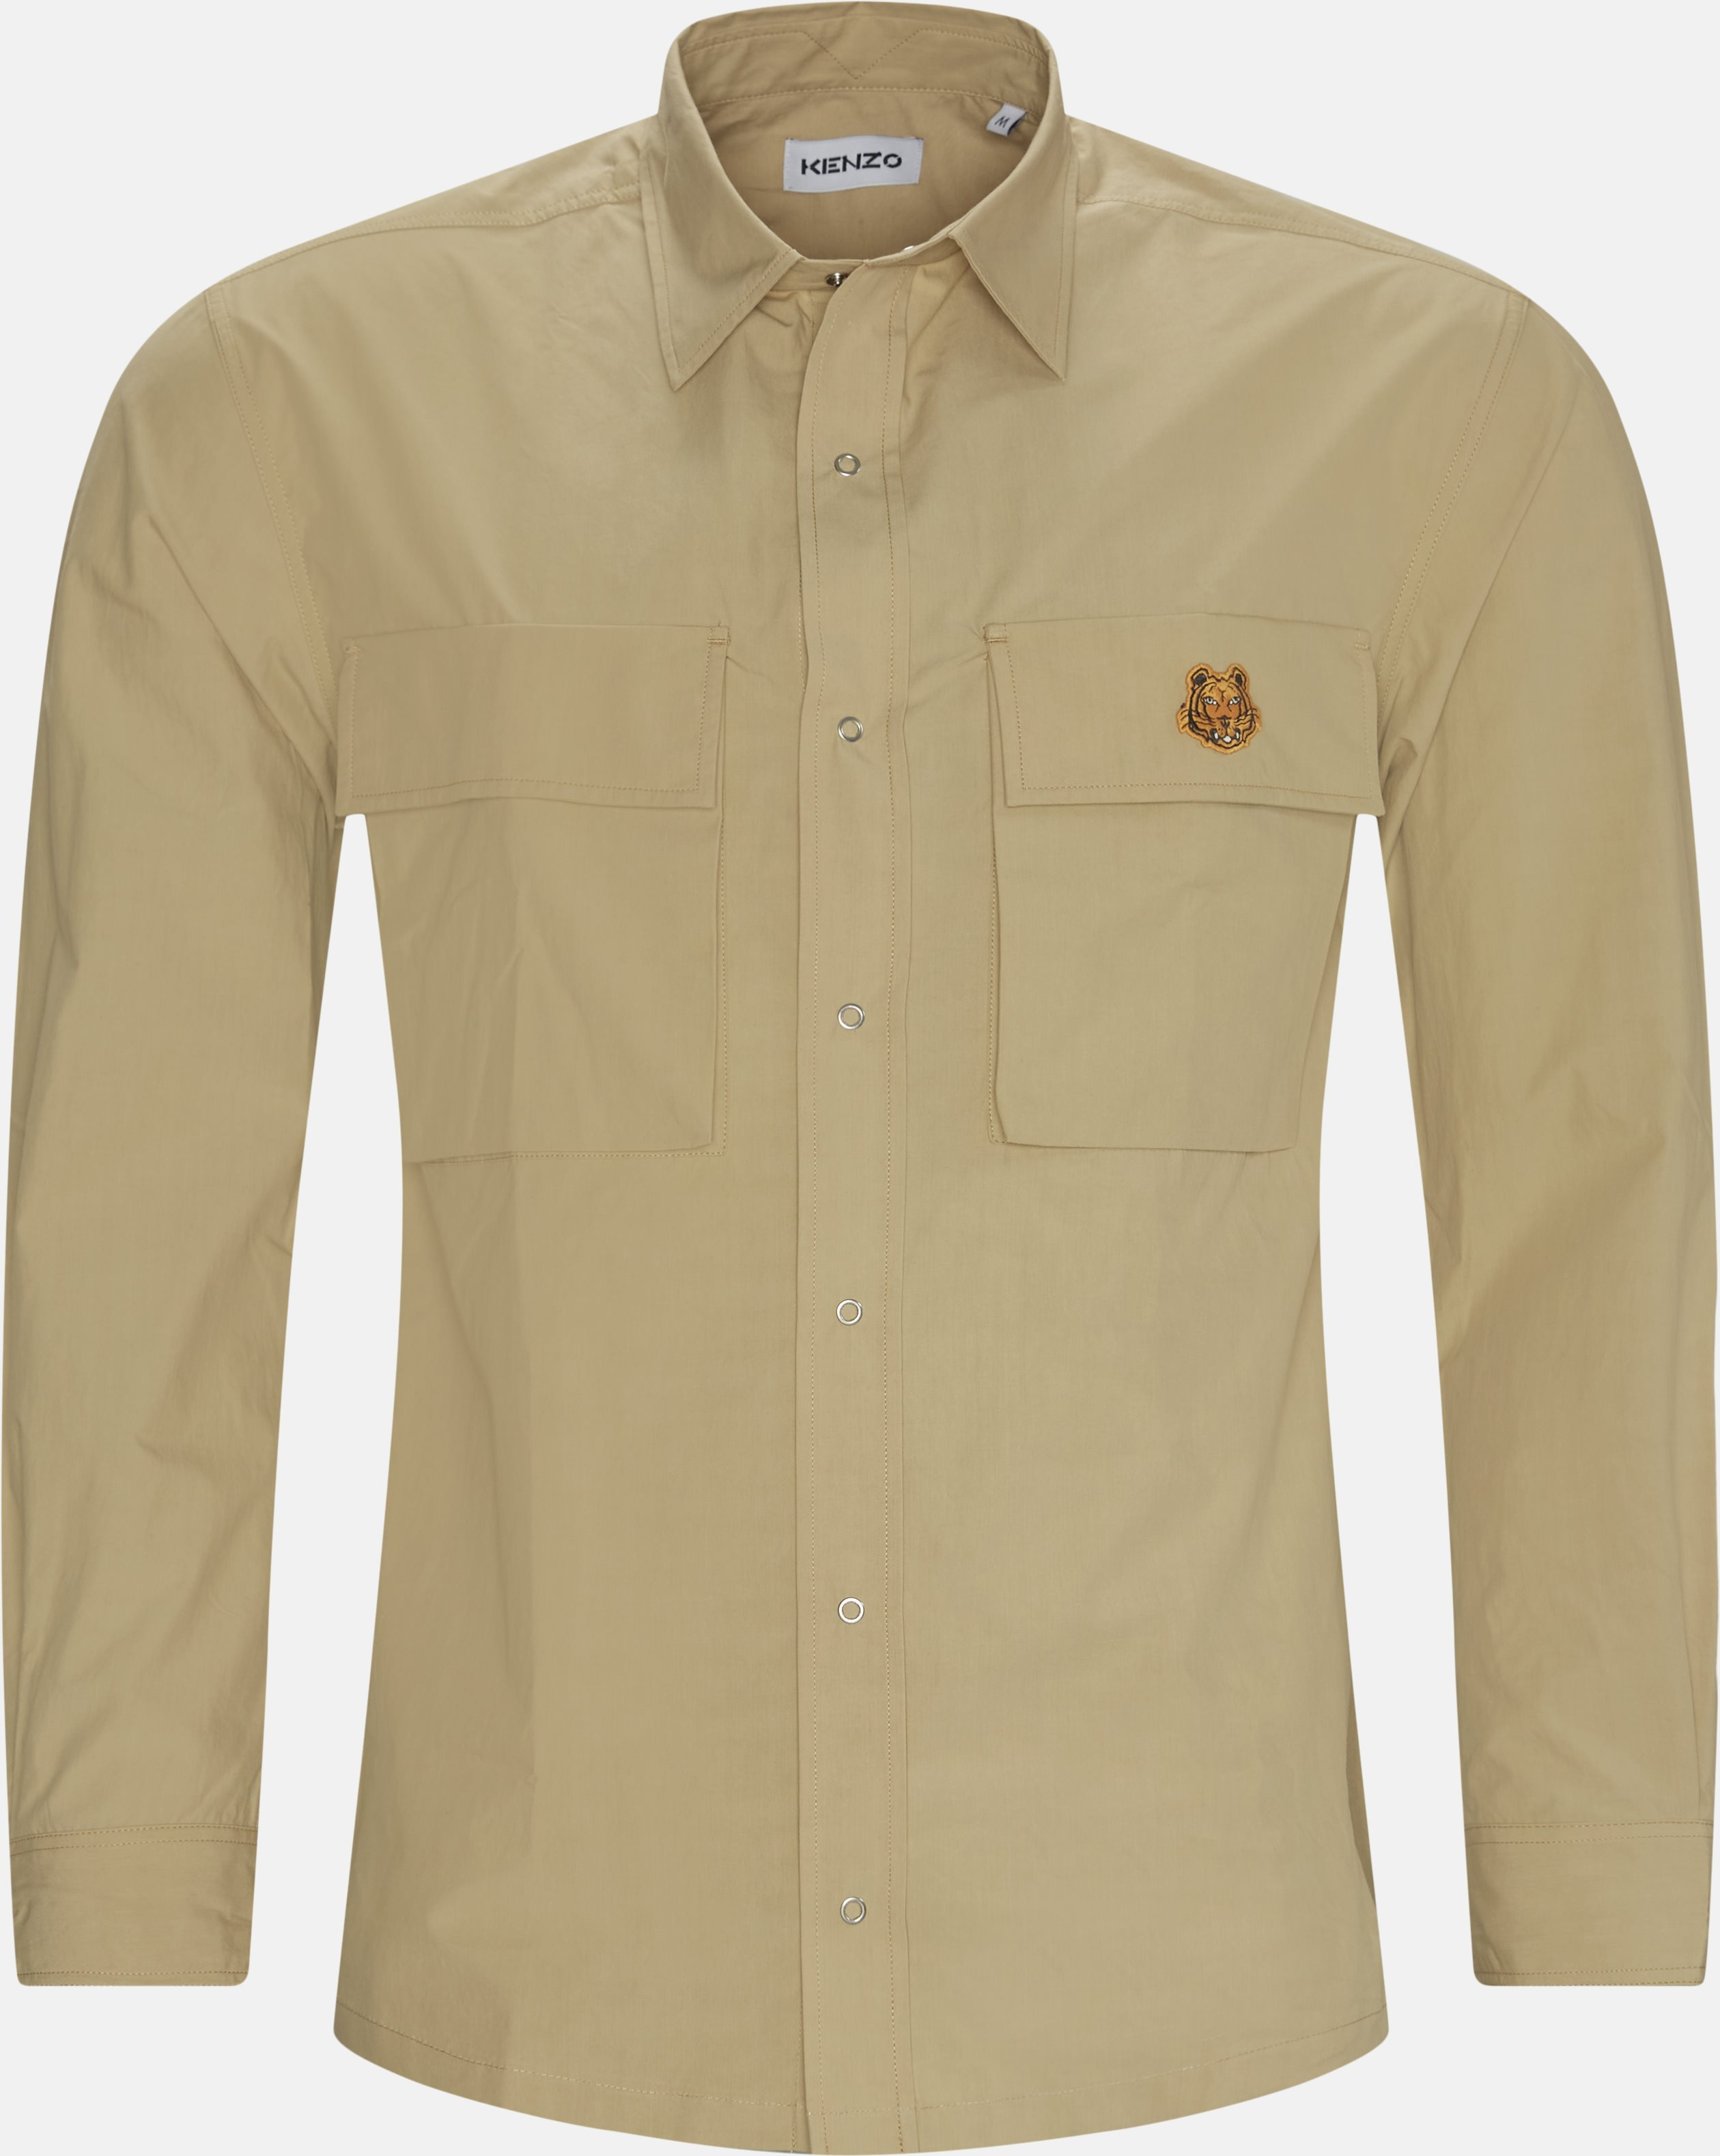 Shirts - Oversize fit - Sand